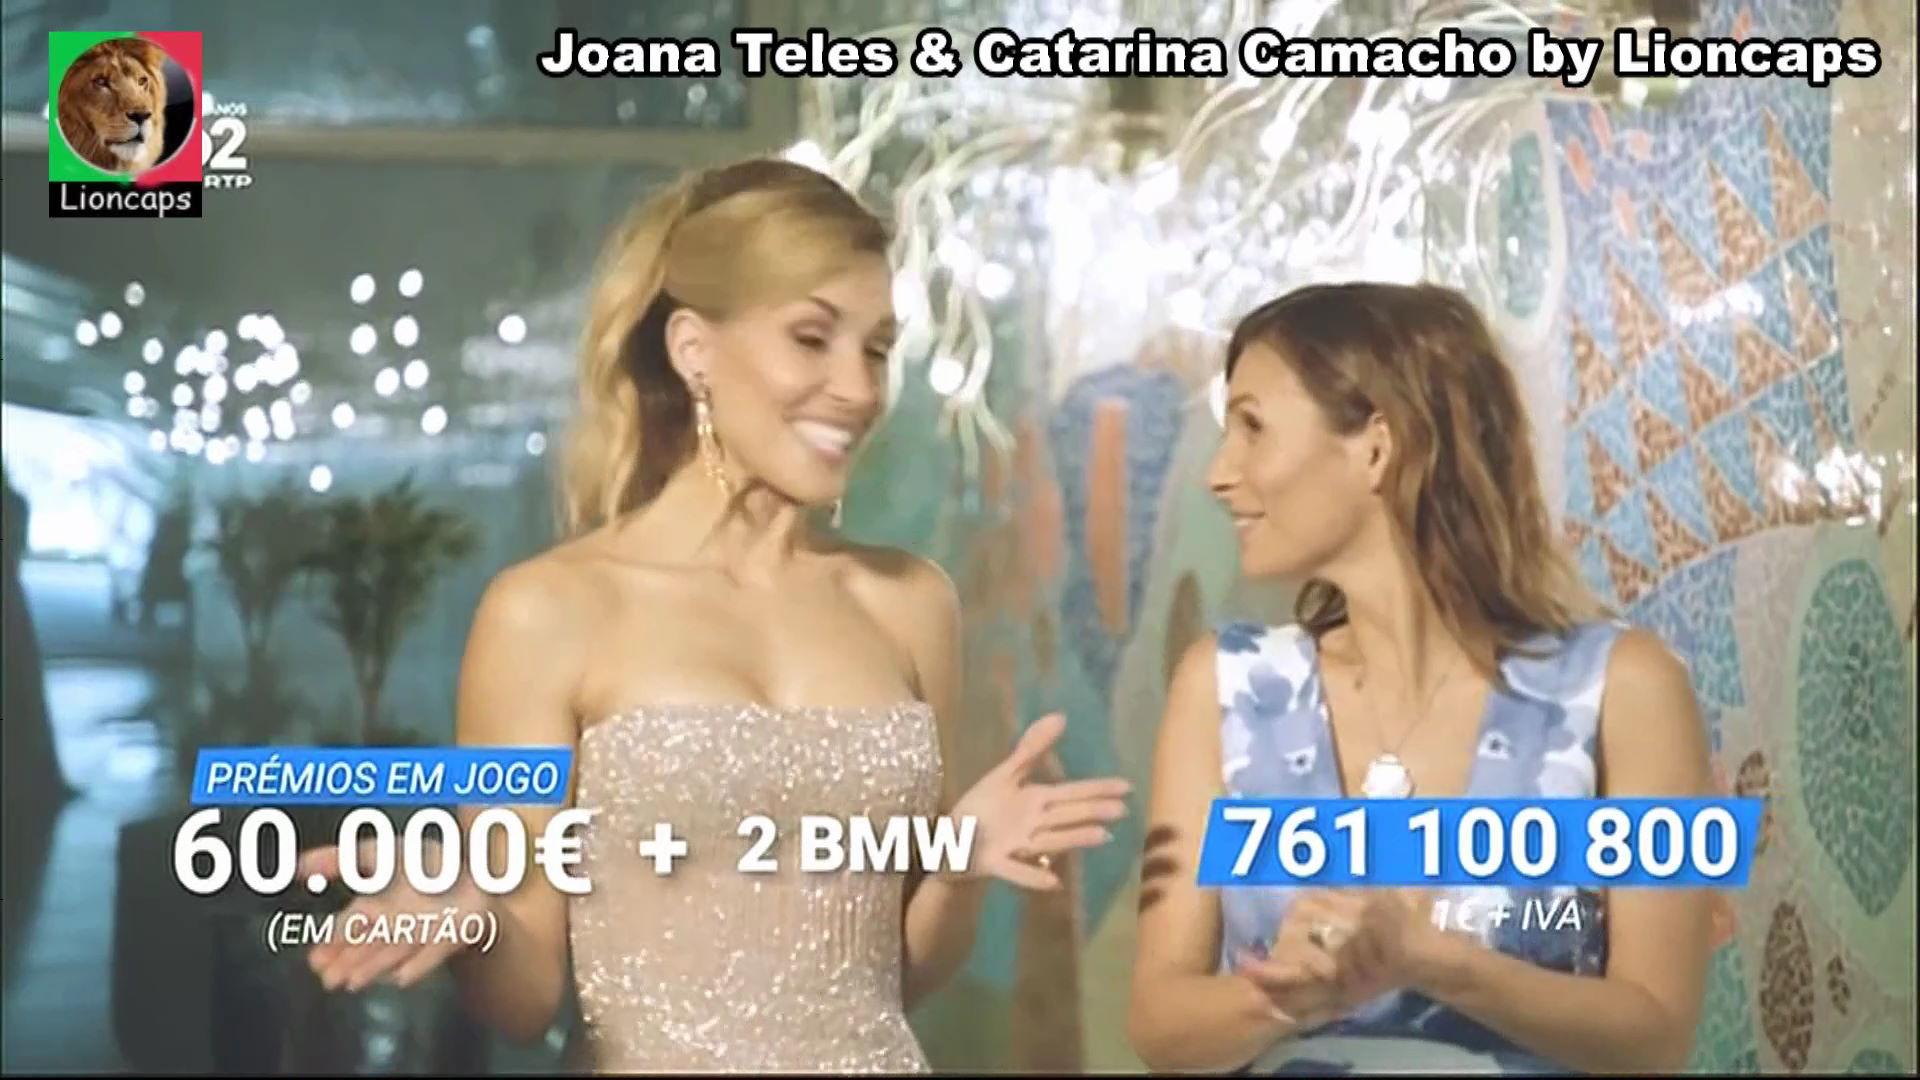 463428356_joana_teles_vs190602_0103_122_465lo.JPG